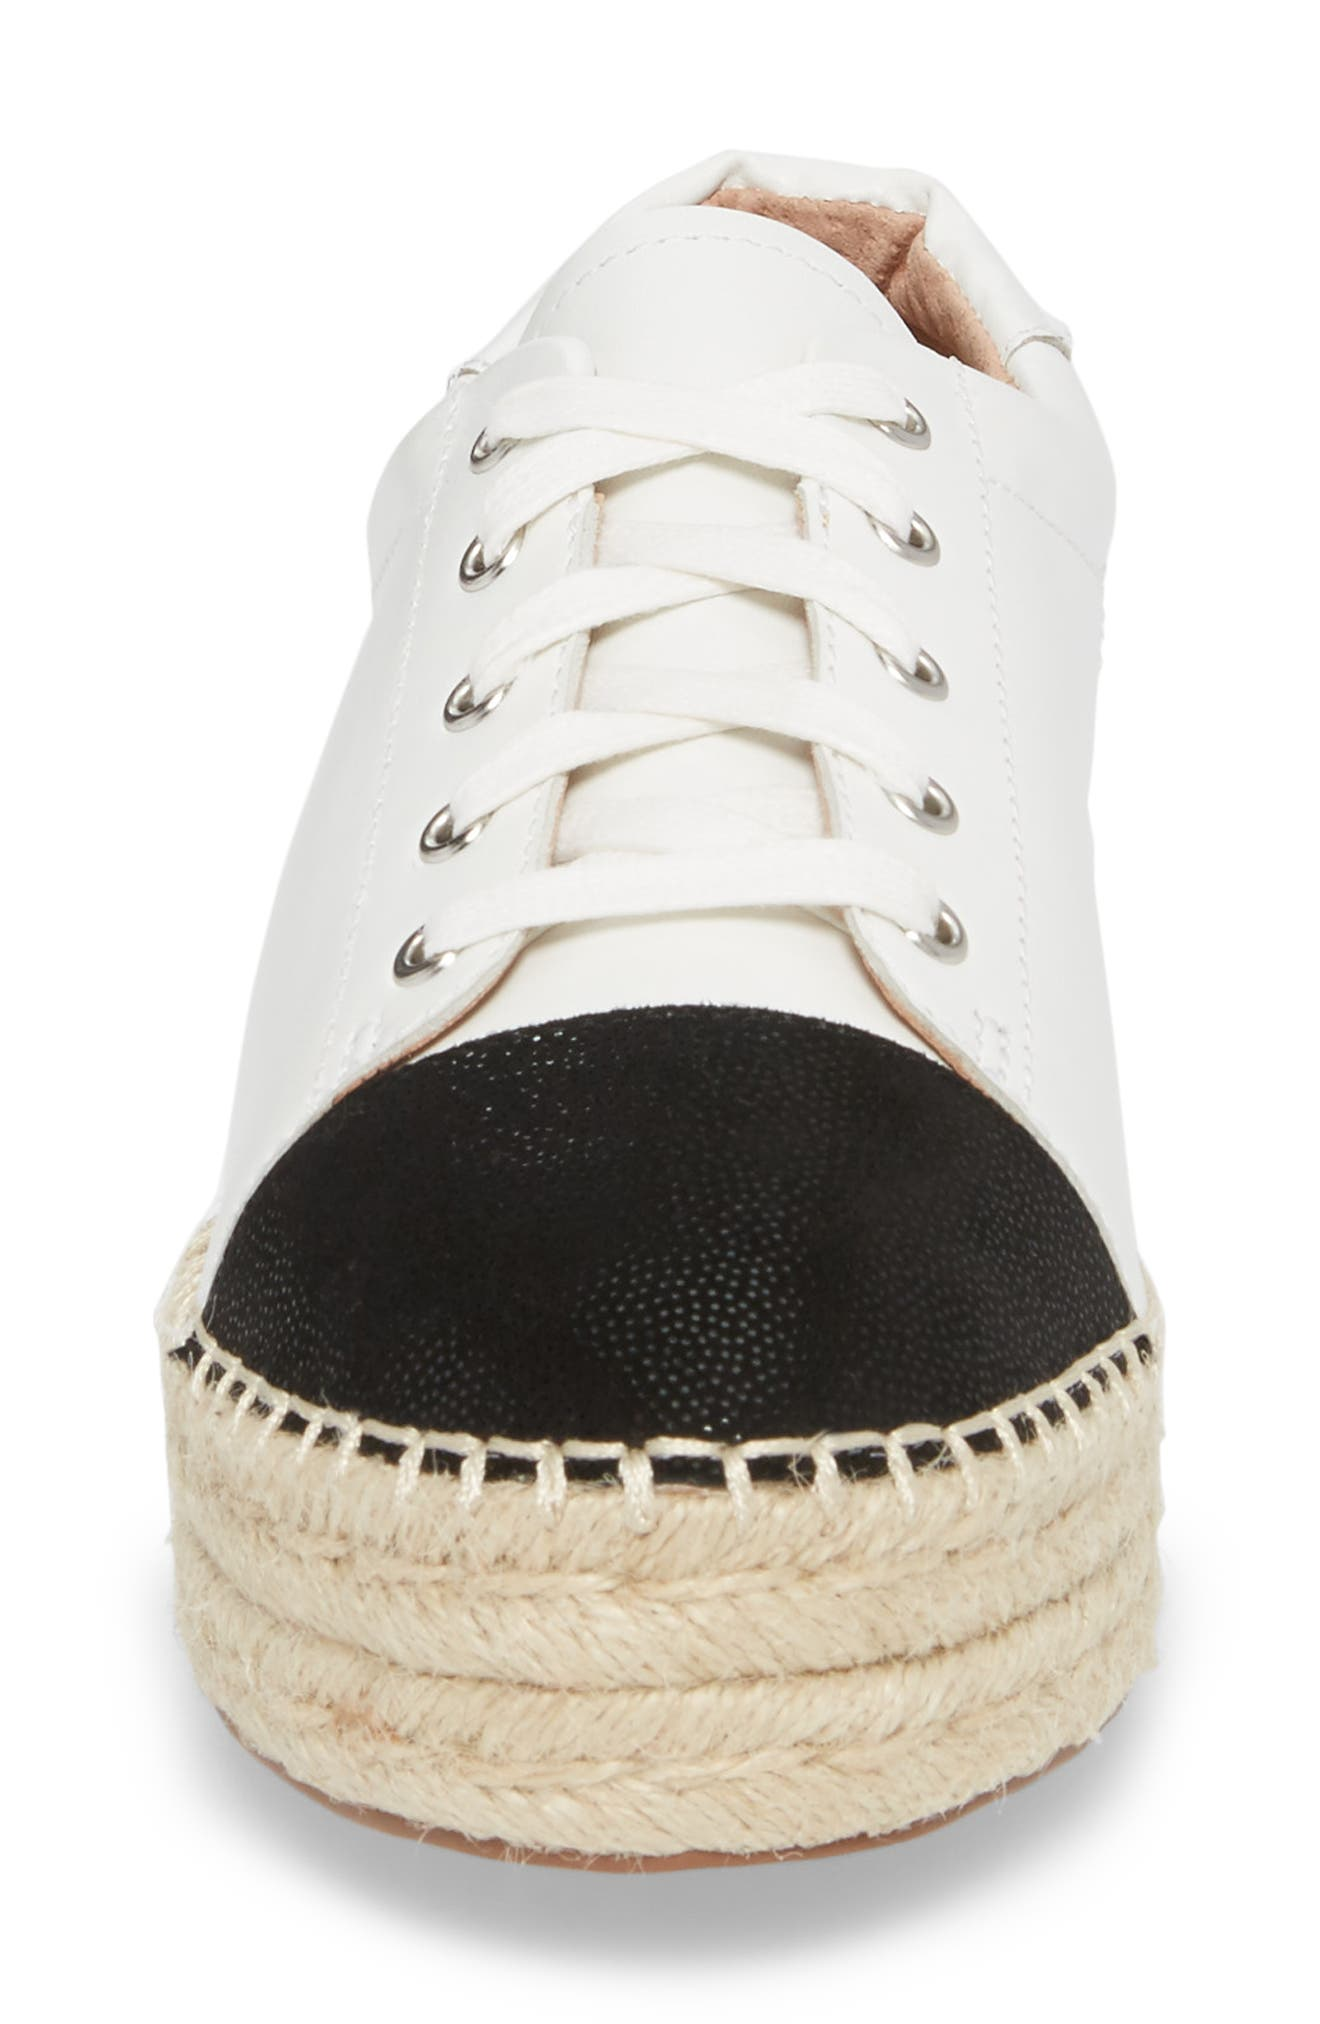 Sierra Espadrille Platform Sneaker,                             Alternate thumbnail 4, color,                             108